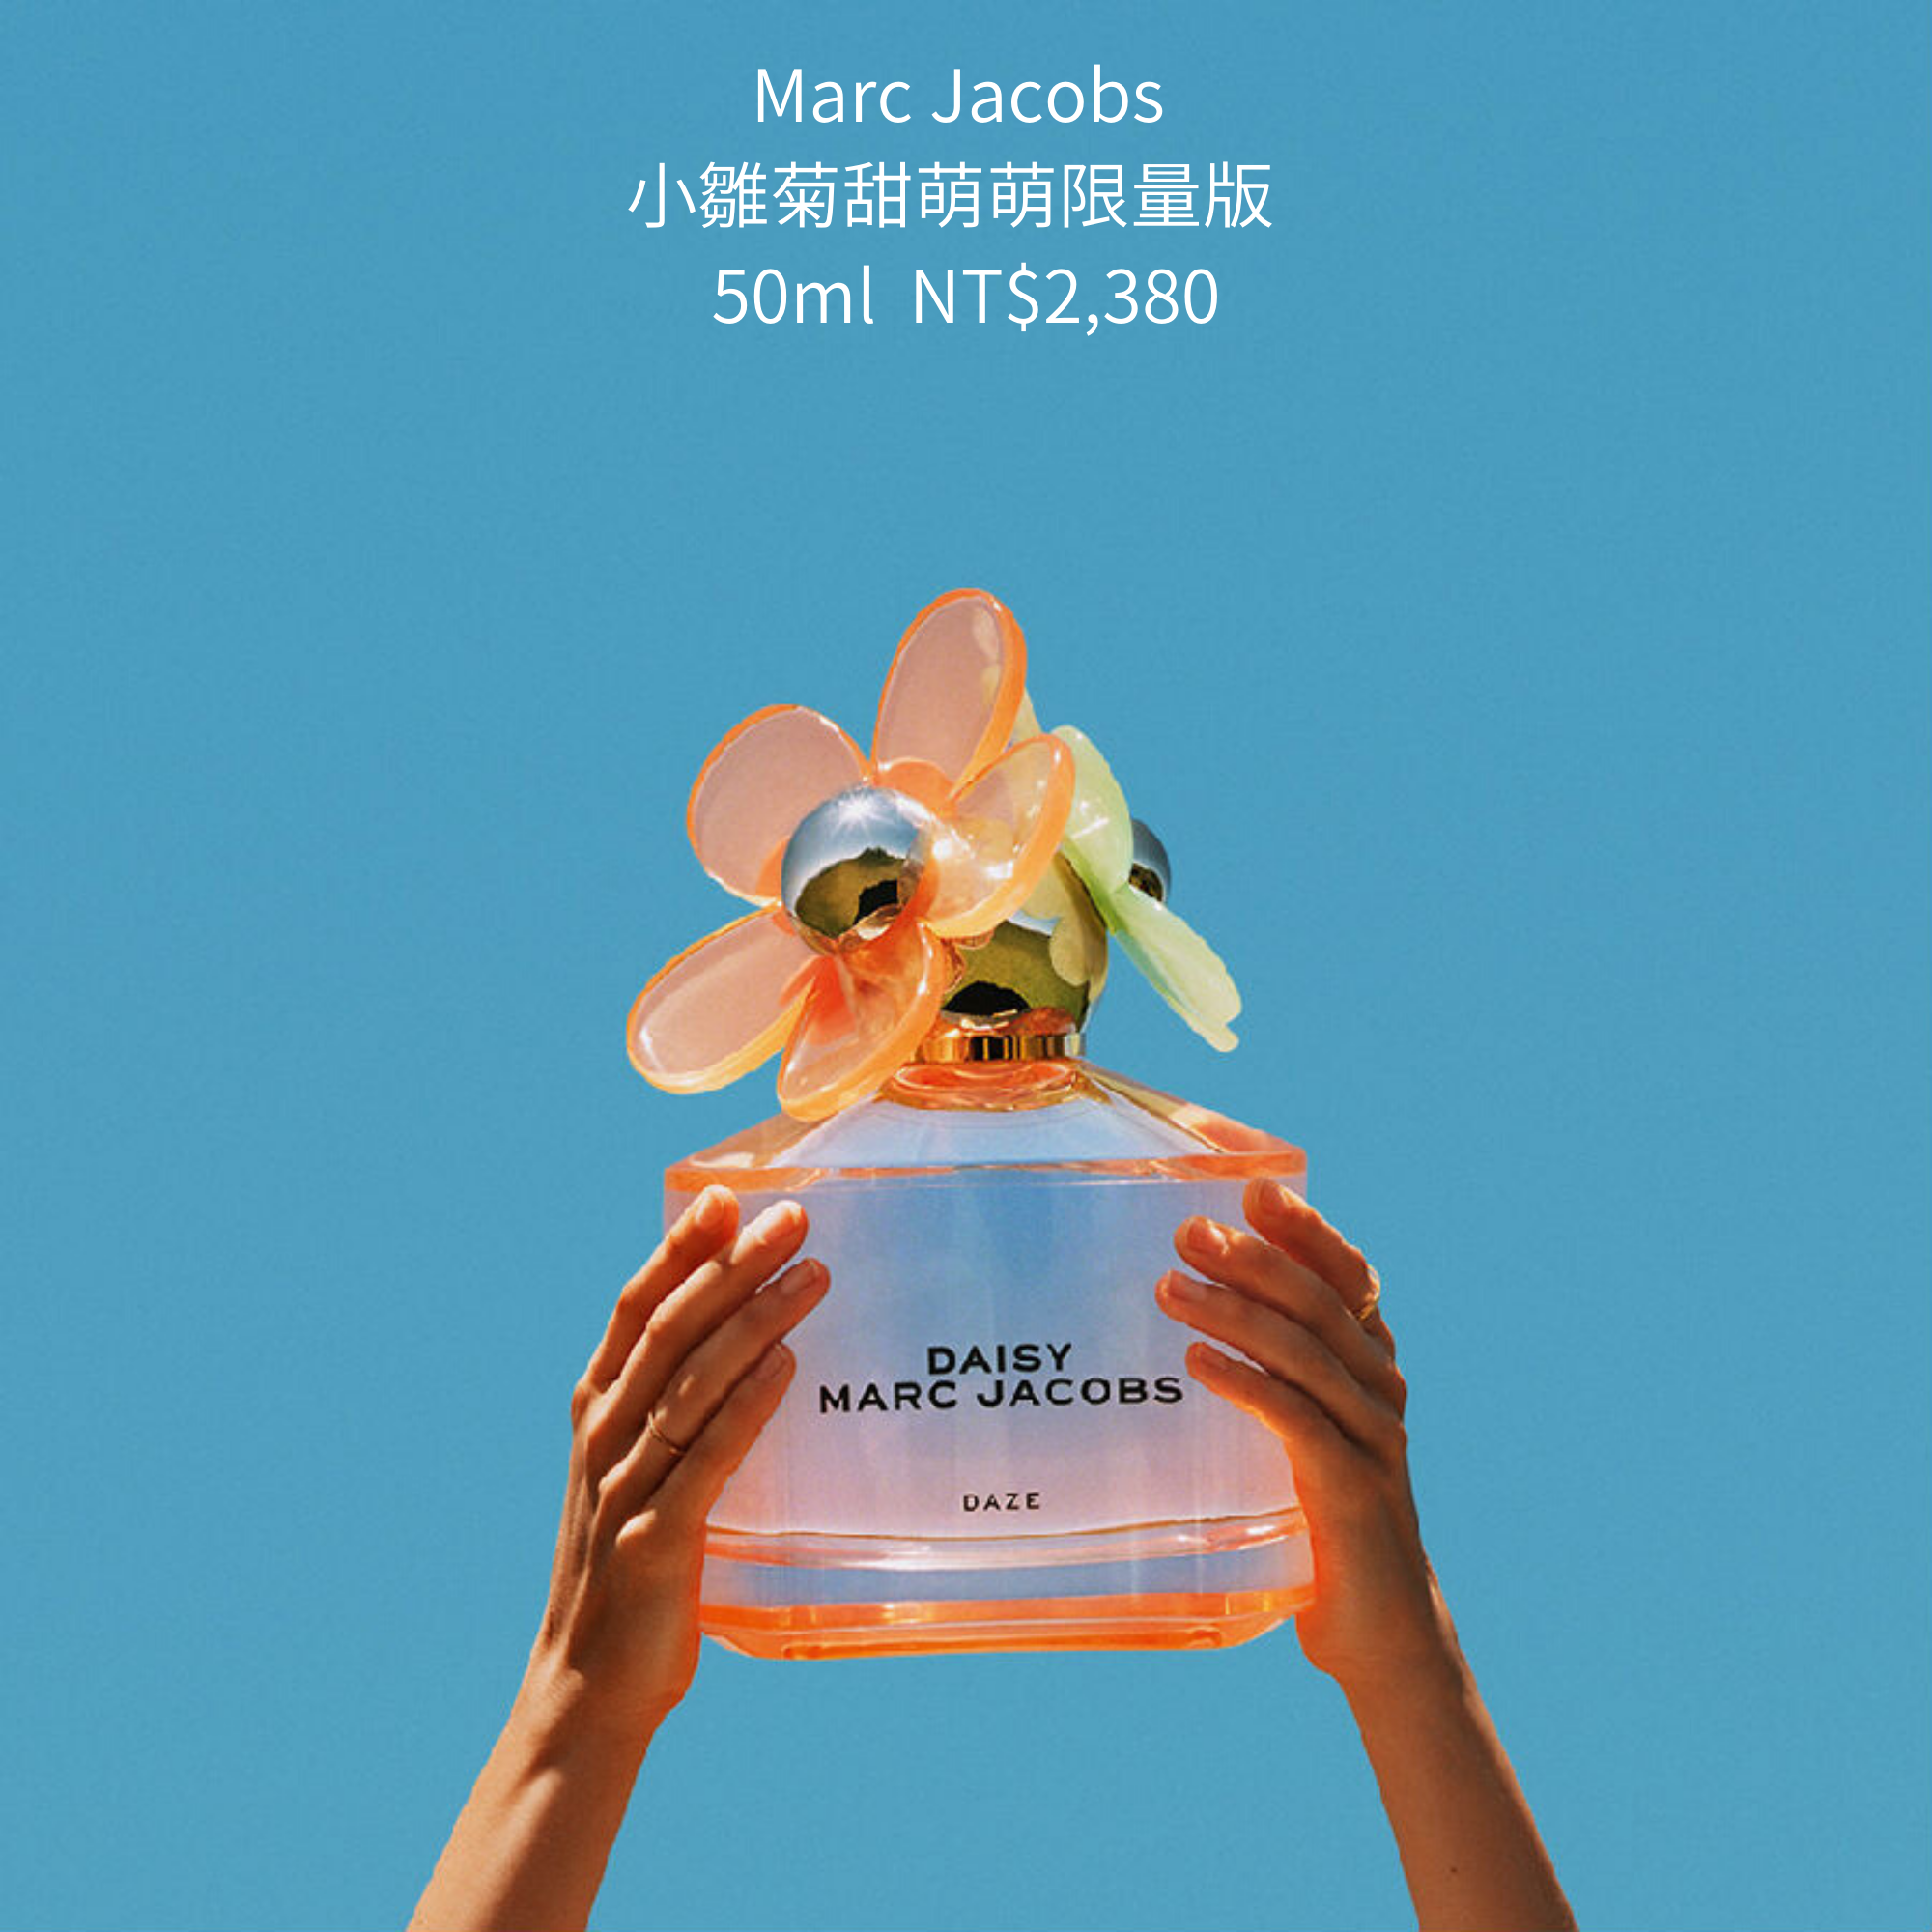 Marc Jacobs 小雛菊甜萌萌限量版 50ml NT$2,380